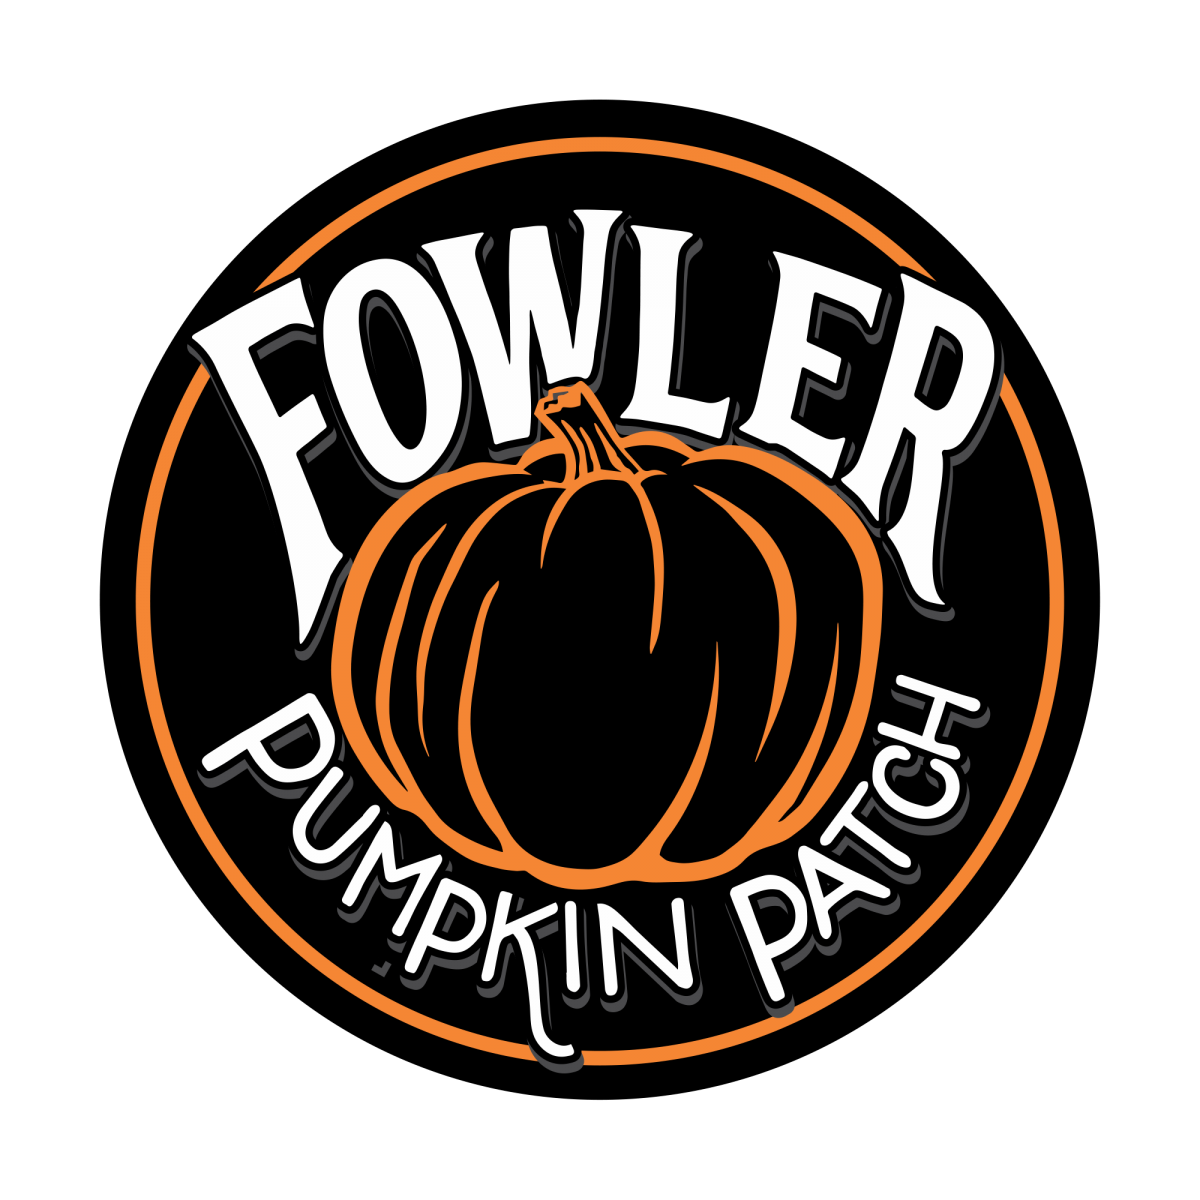 fowler-pumpkin-patch-logo-black-circle